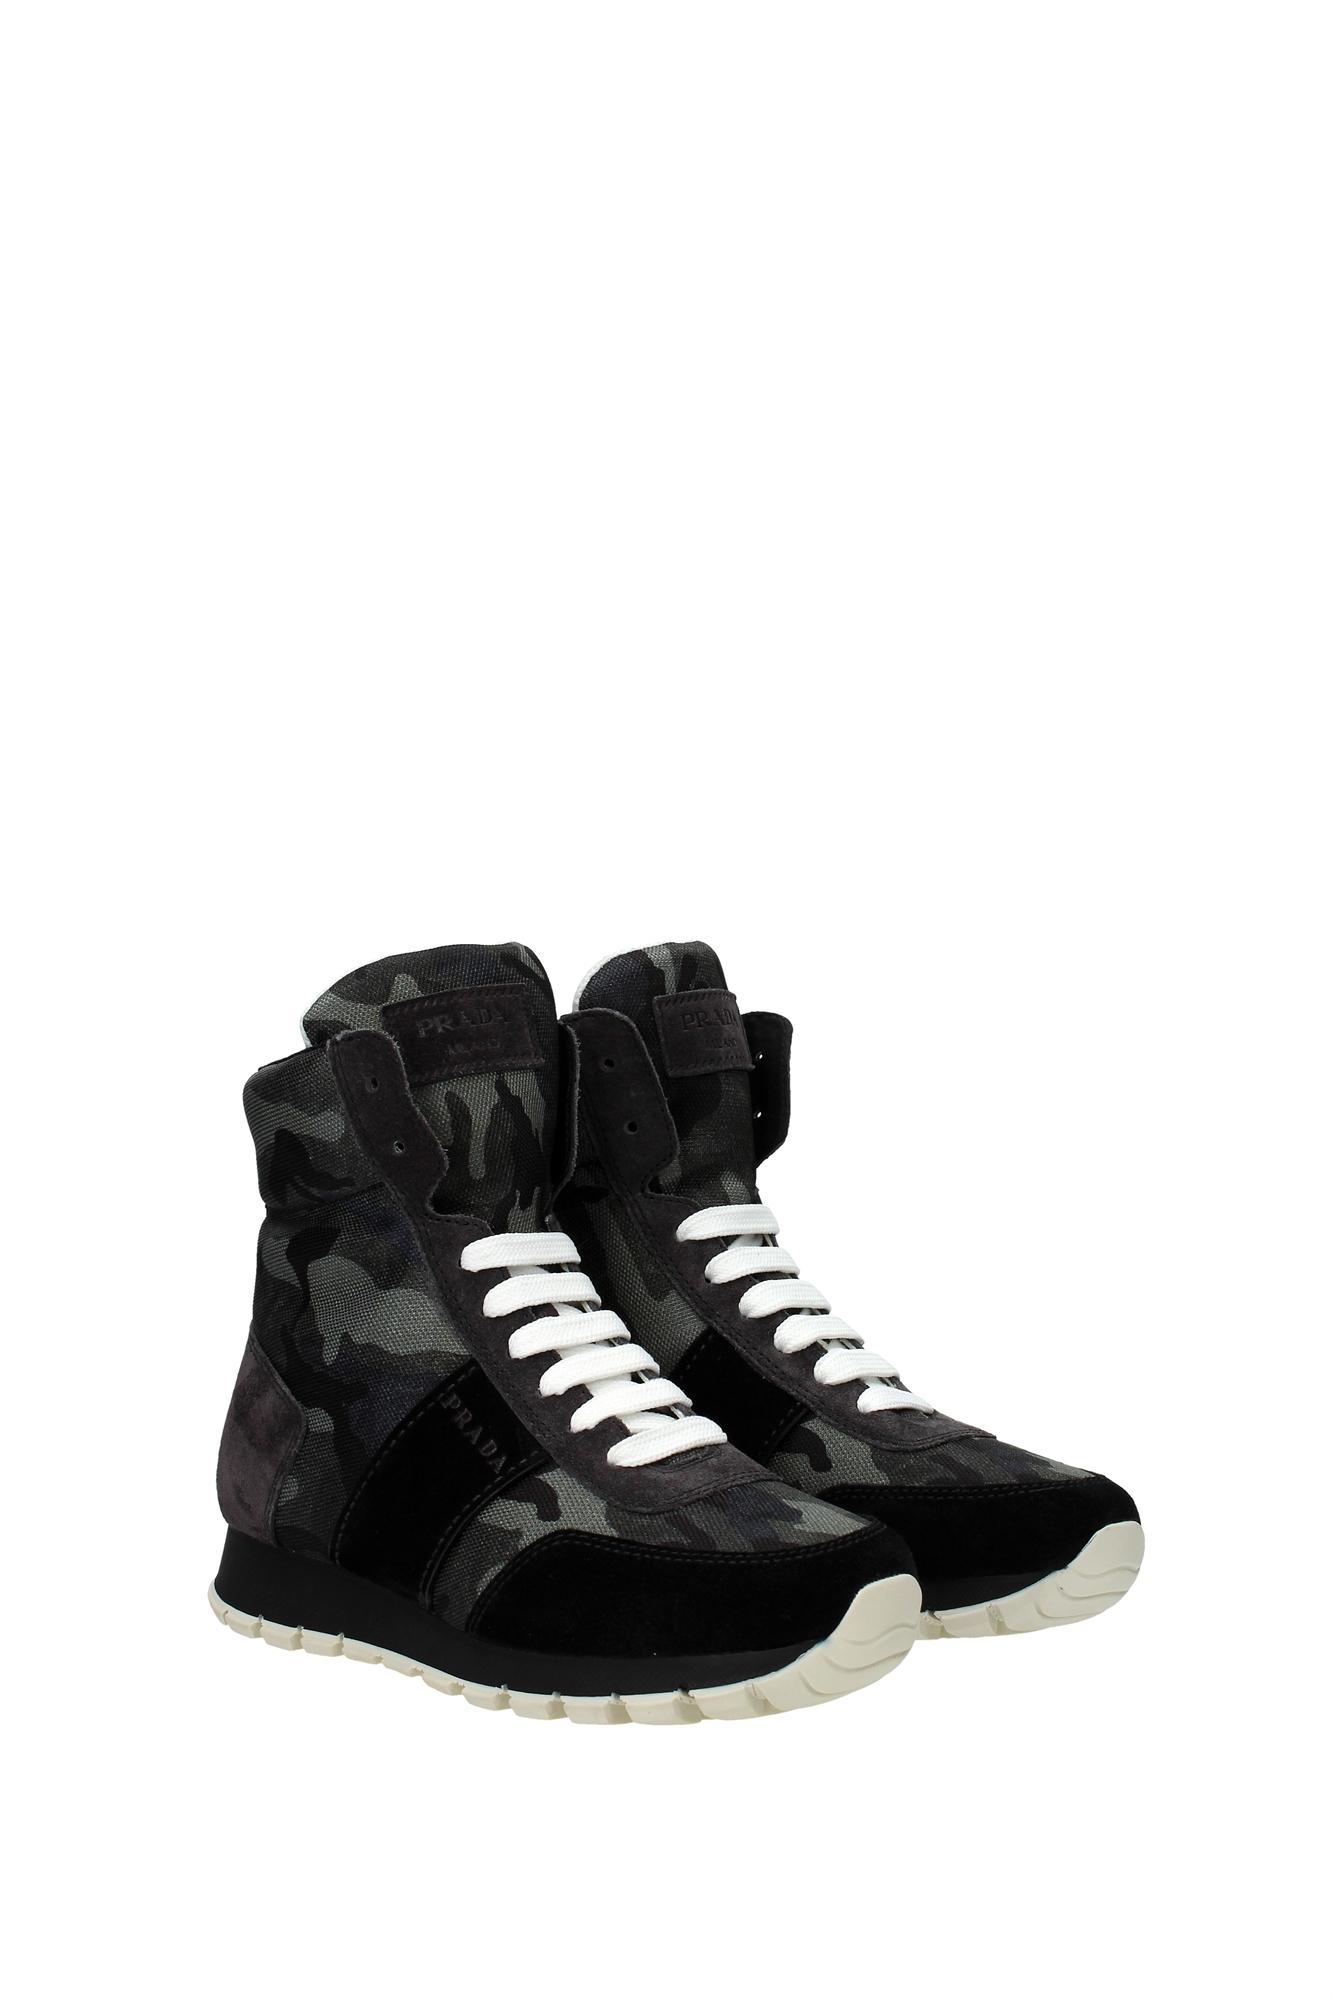 sneakers prada damen stoff gr n 3t6111nerocamouflage ebay. Black Bedroom Furniture Sets. Home Design Ideas